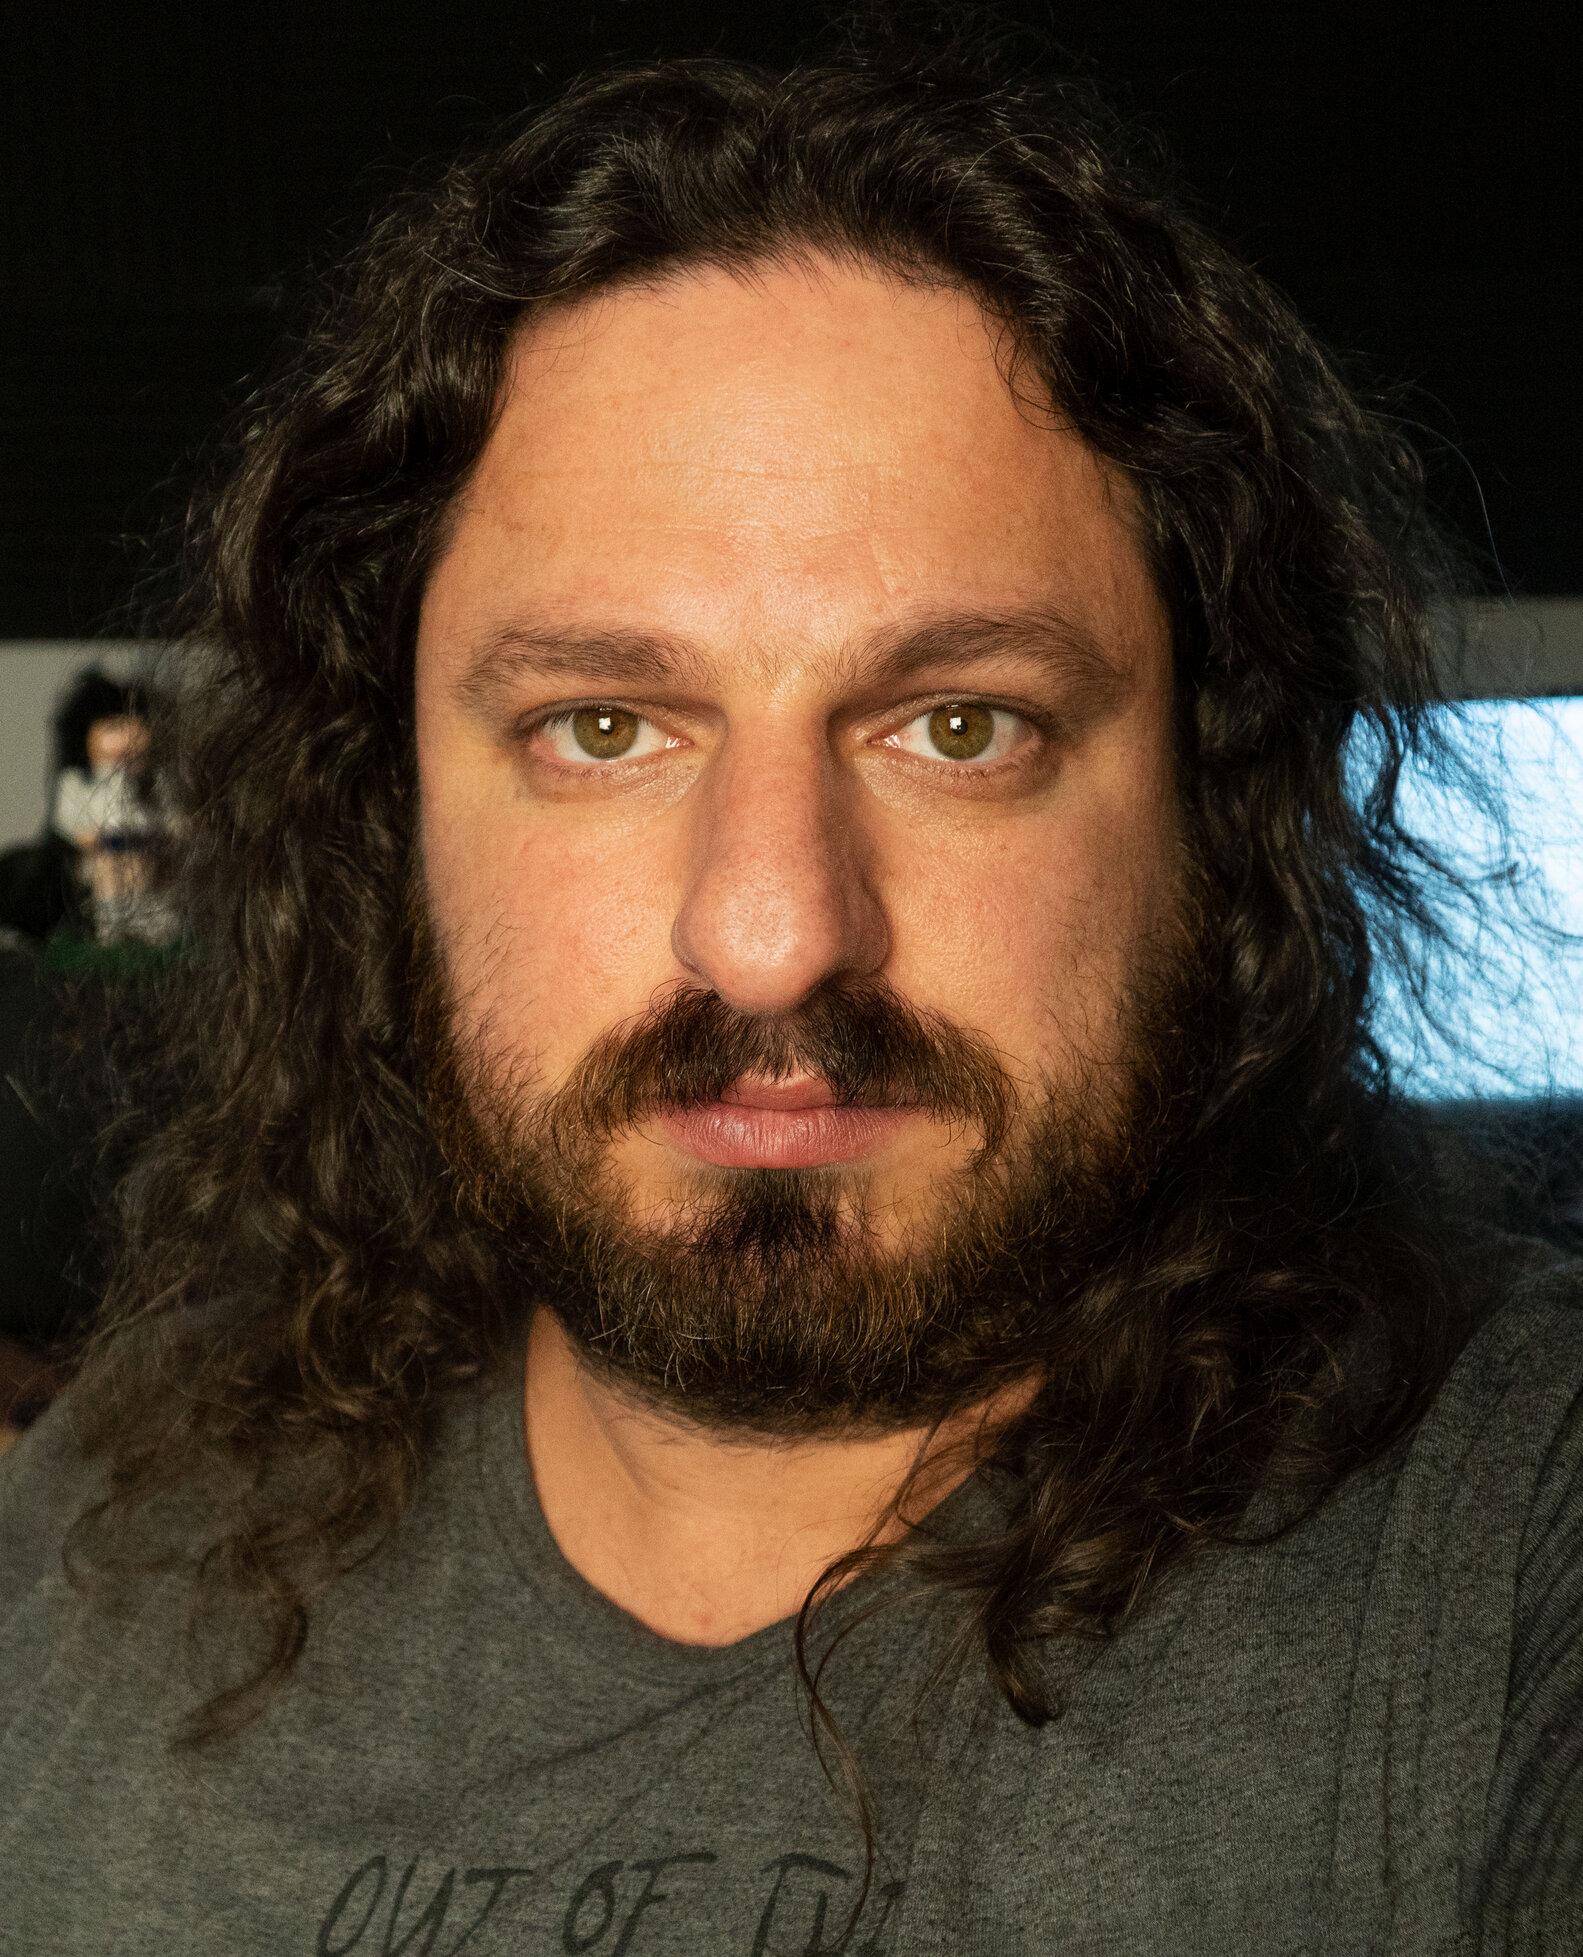 INTERVIEW WITH DIRECTOR VLADIMIR DZYAKEVICH